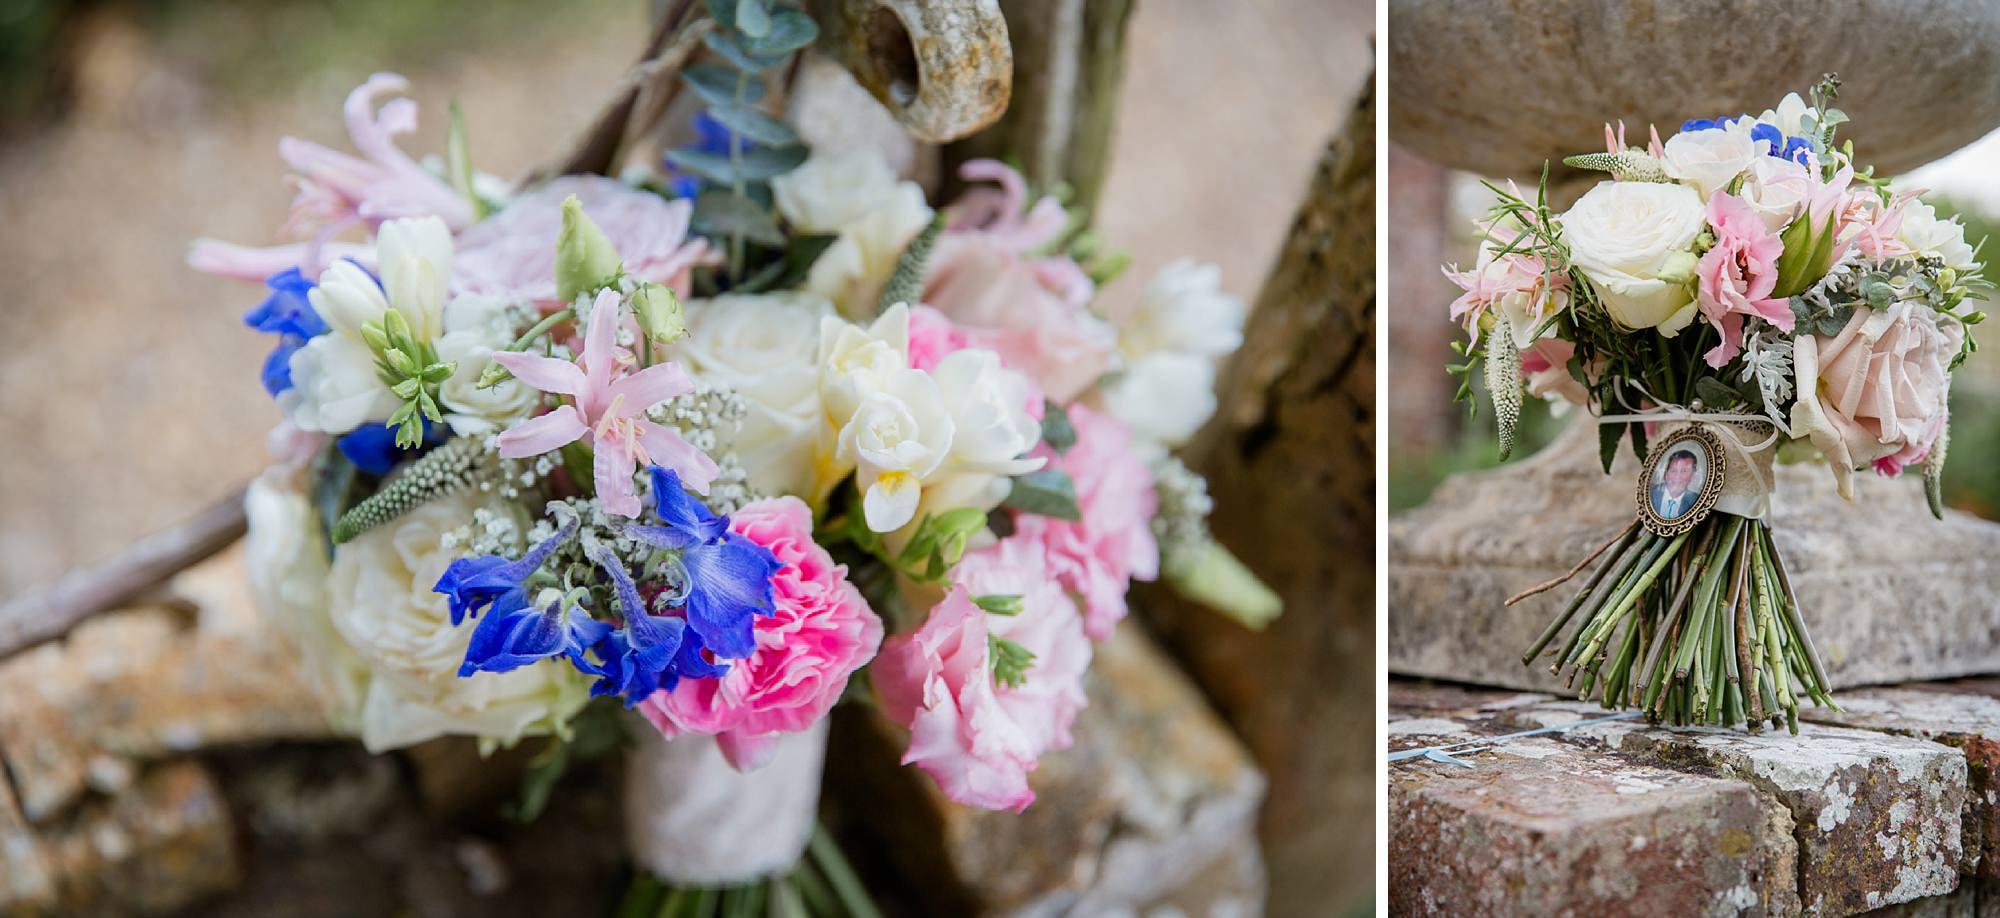 Bignor Park wedding photography detail of bouquets